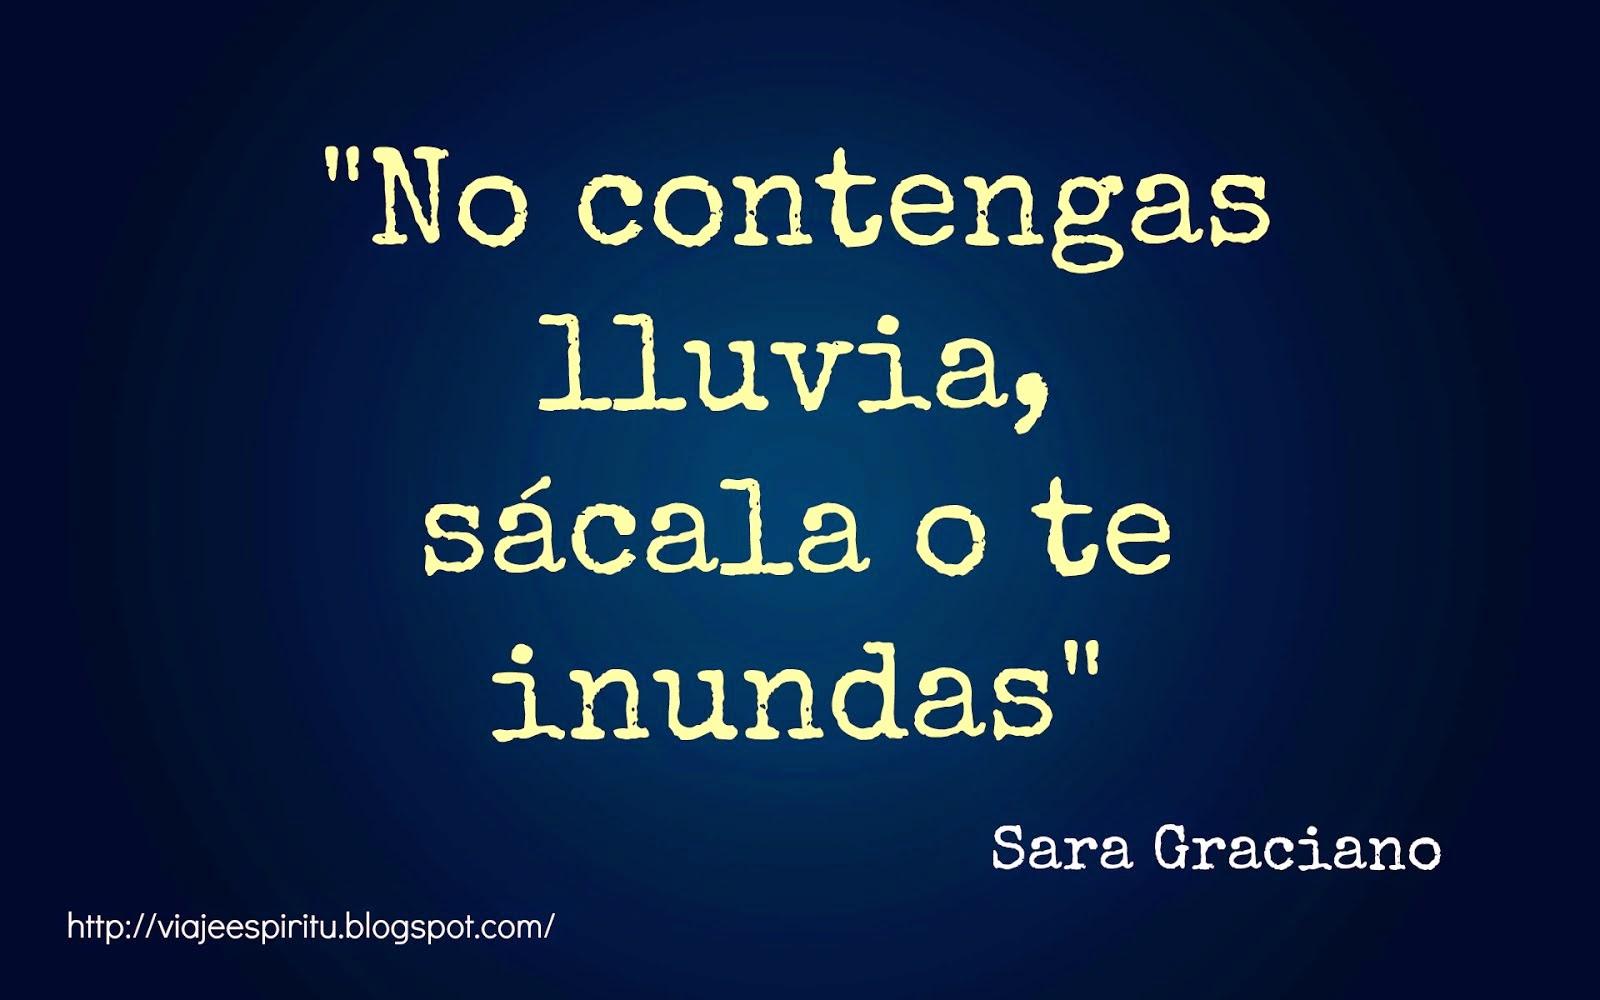 Solicito, Sara Graciano